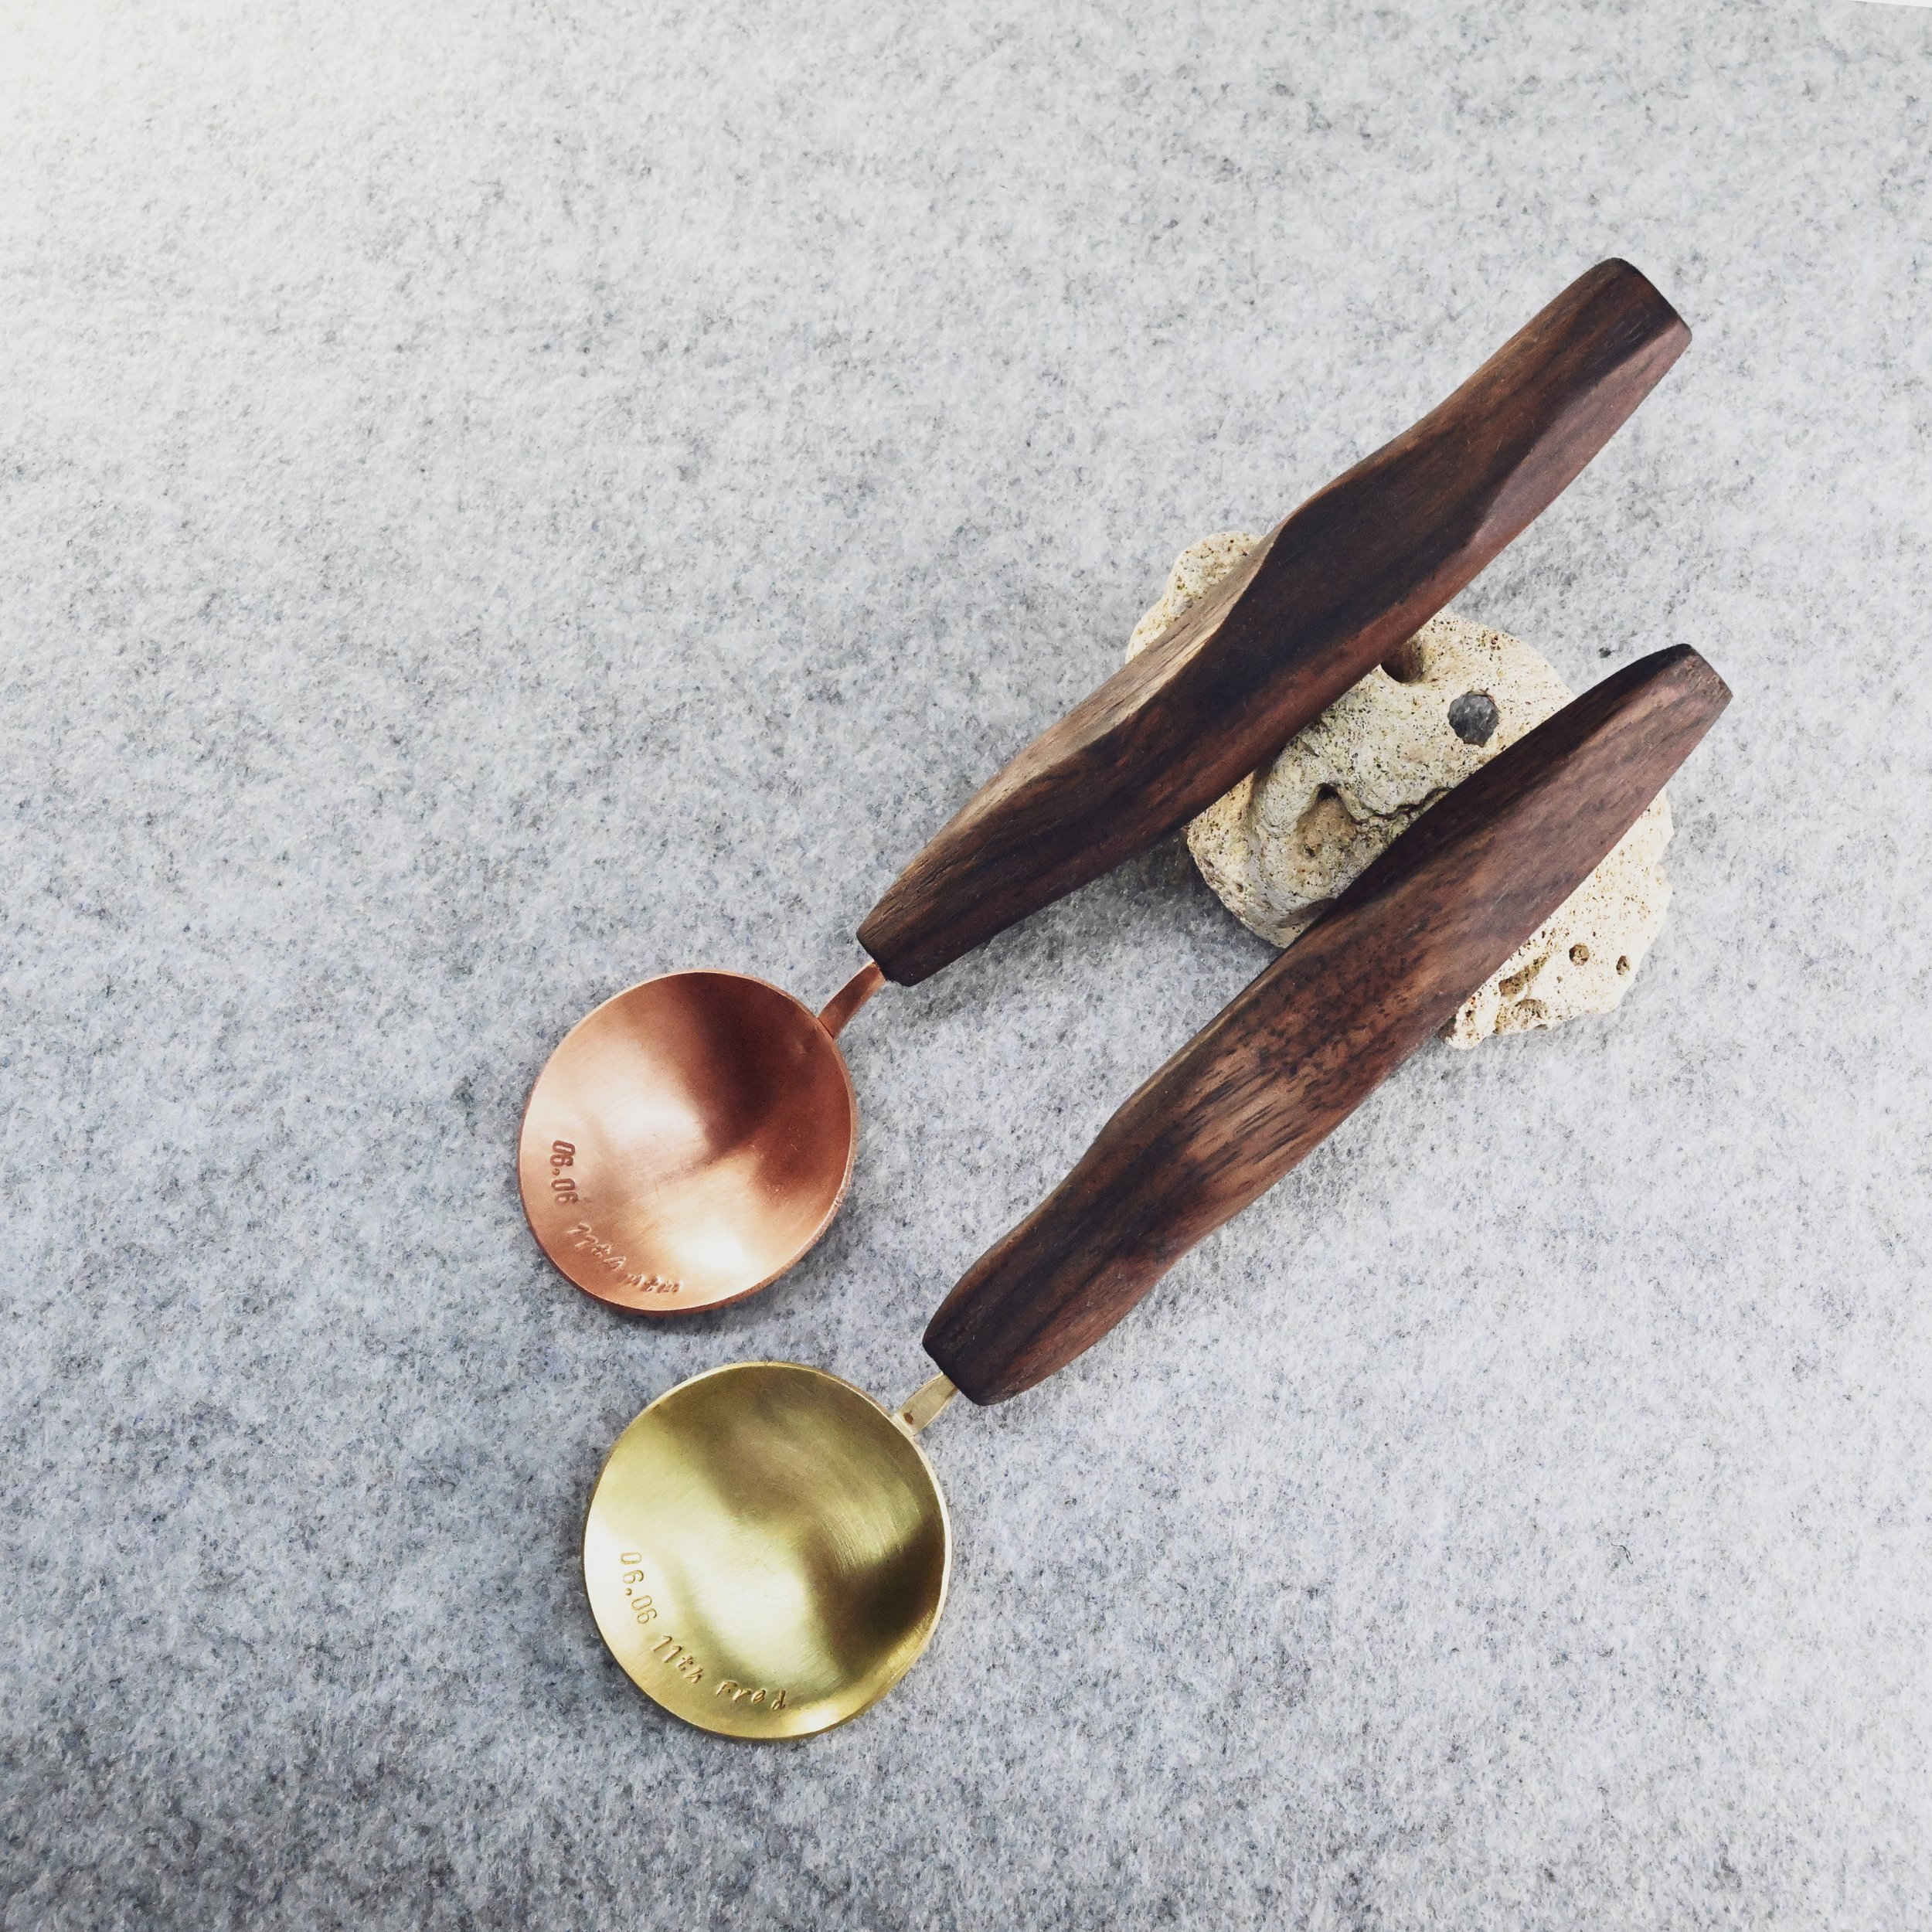 2.5hrs 銅匙製作班Copper spoon making - 適合新手/自稱手殘者如果你對餐具情有獨鍾,又想體驗如何手製屬於自己的銅匙,可以參加這個生活器具鍛打班~成品即日拎走